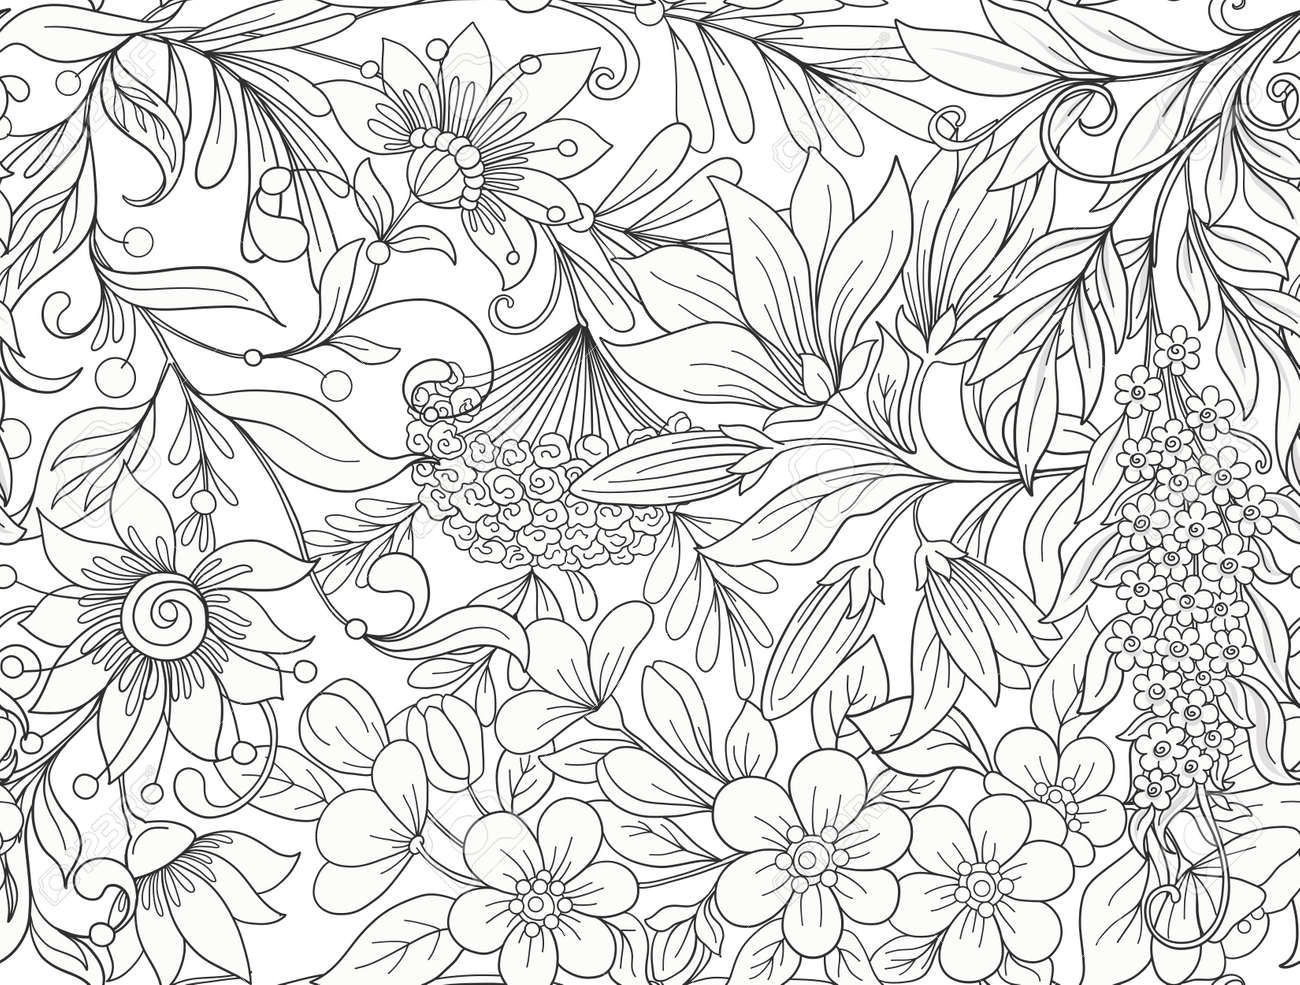 Seamless pattern, background with spring flowers magnolia, sak - 86152852